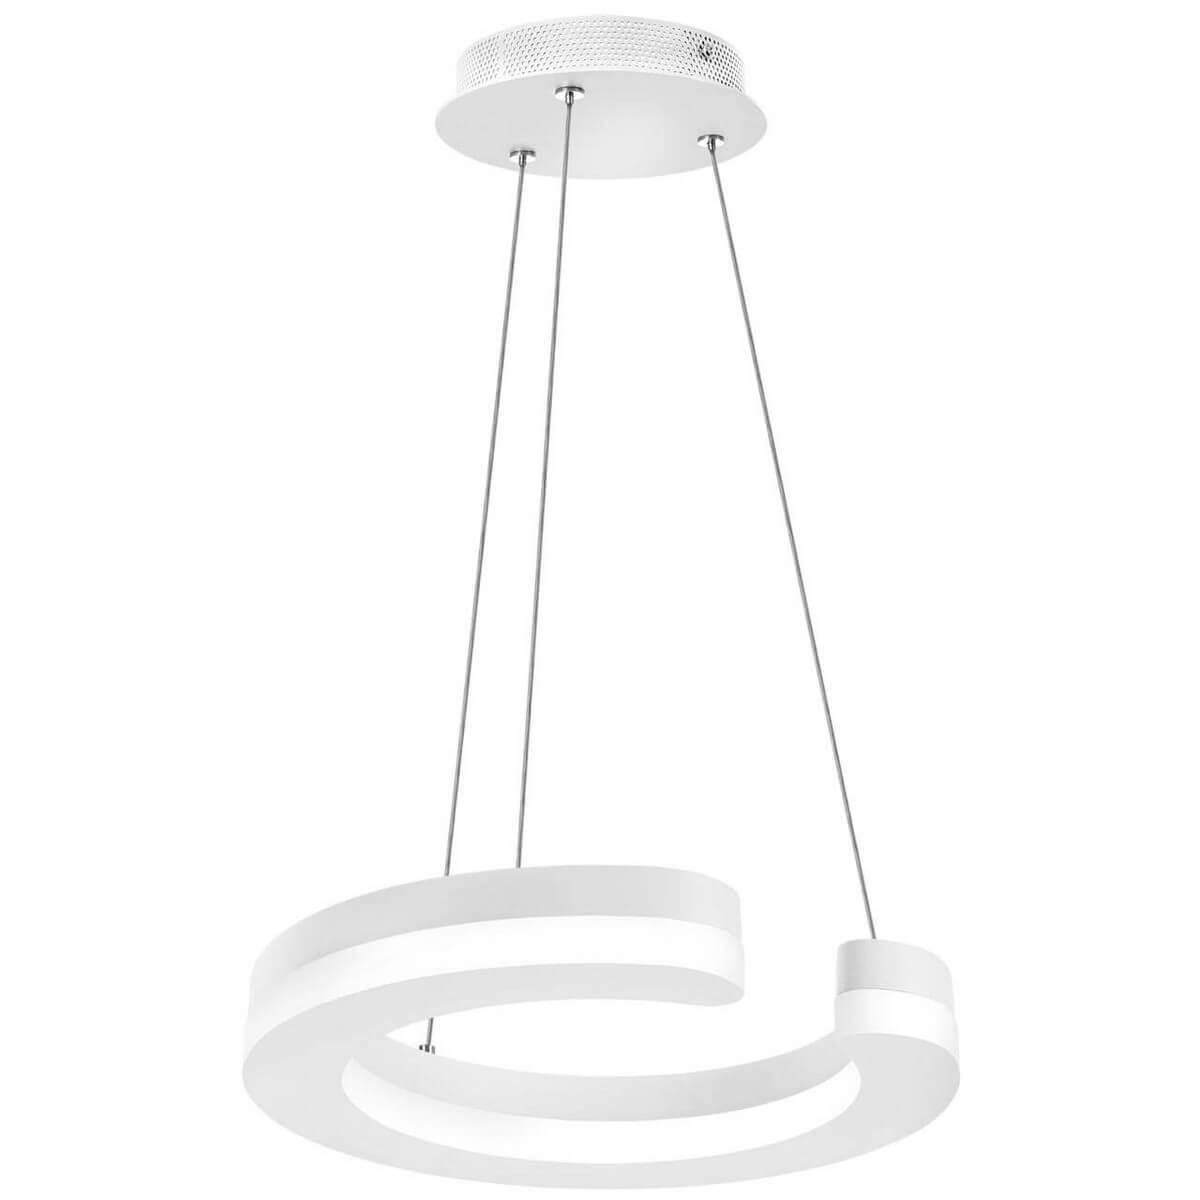 Светильник Lightstar 763146 Unitario подвесной светильник unitario 763246